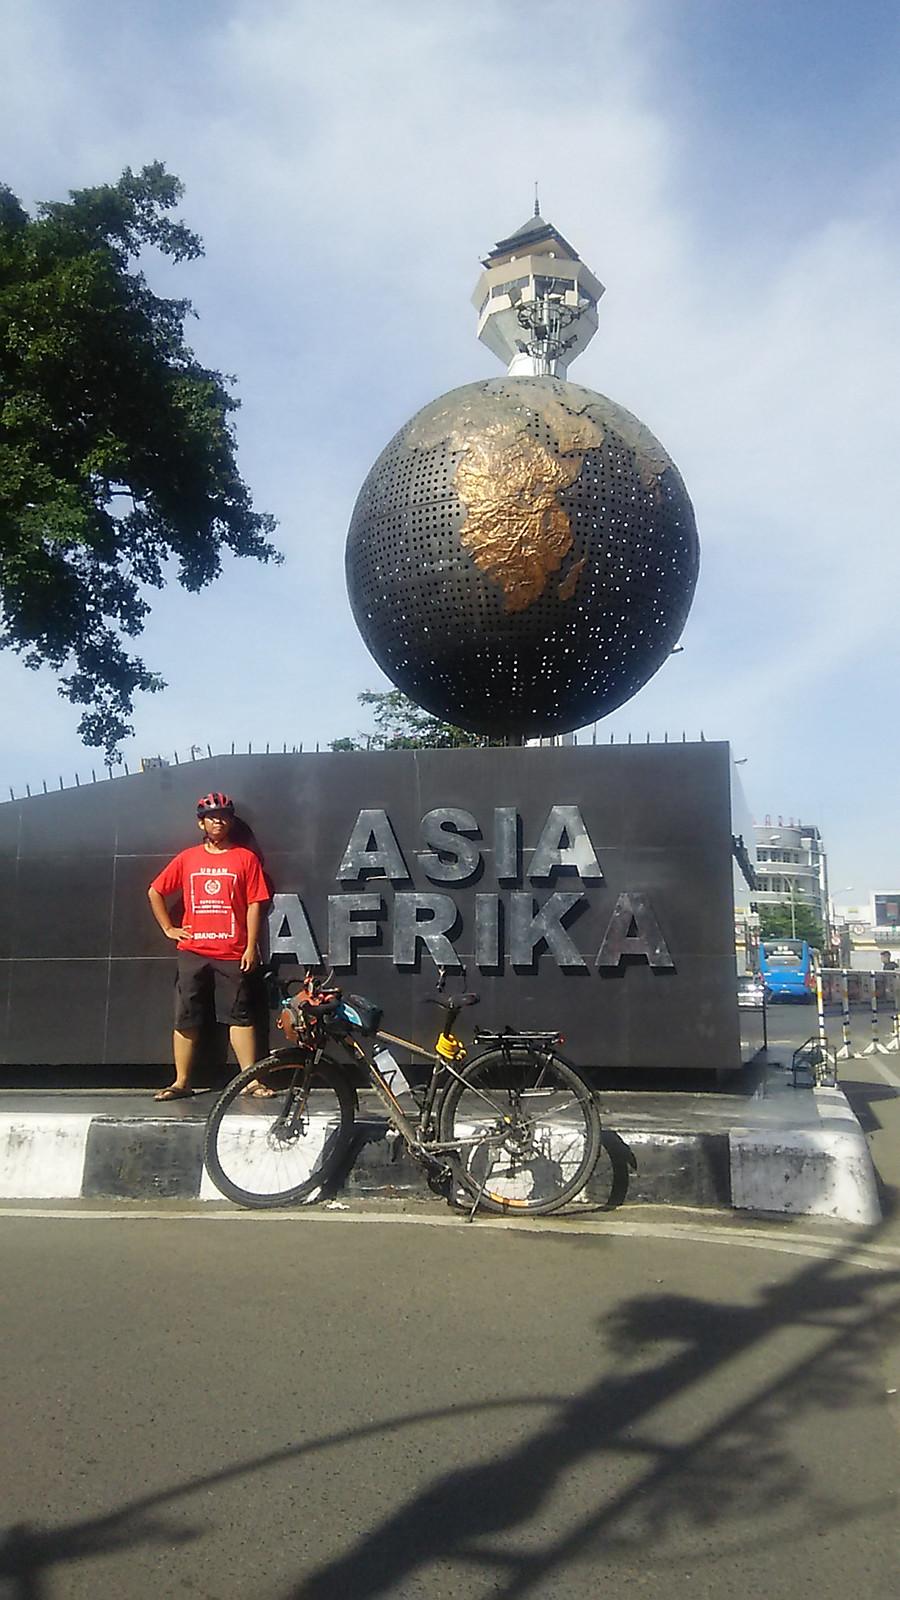 Jalan Asia Afrika, lokasi digelarnya KAA (Konferensi Asia Afrika)